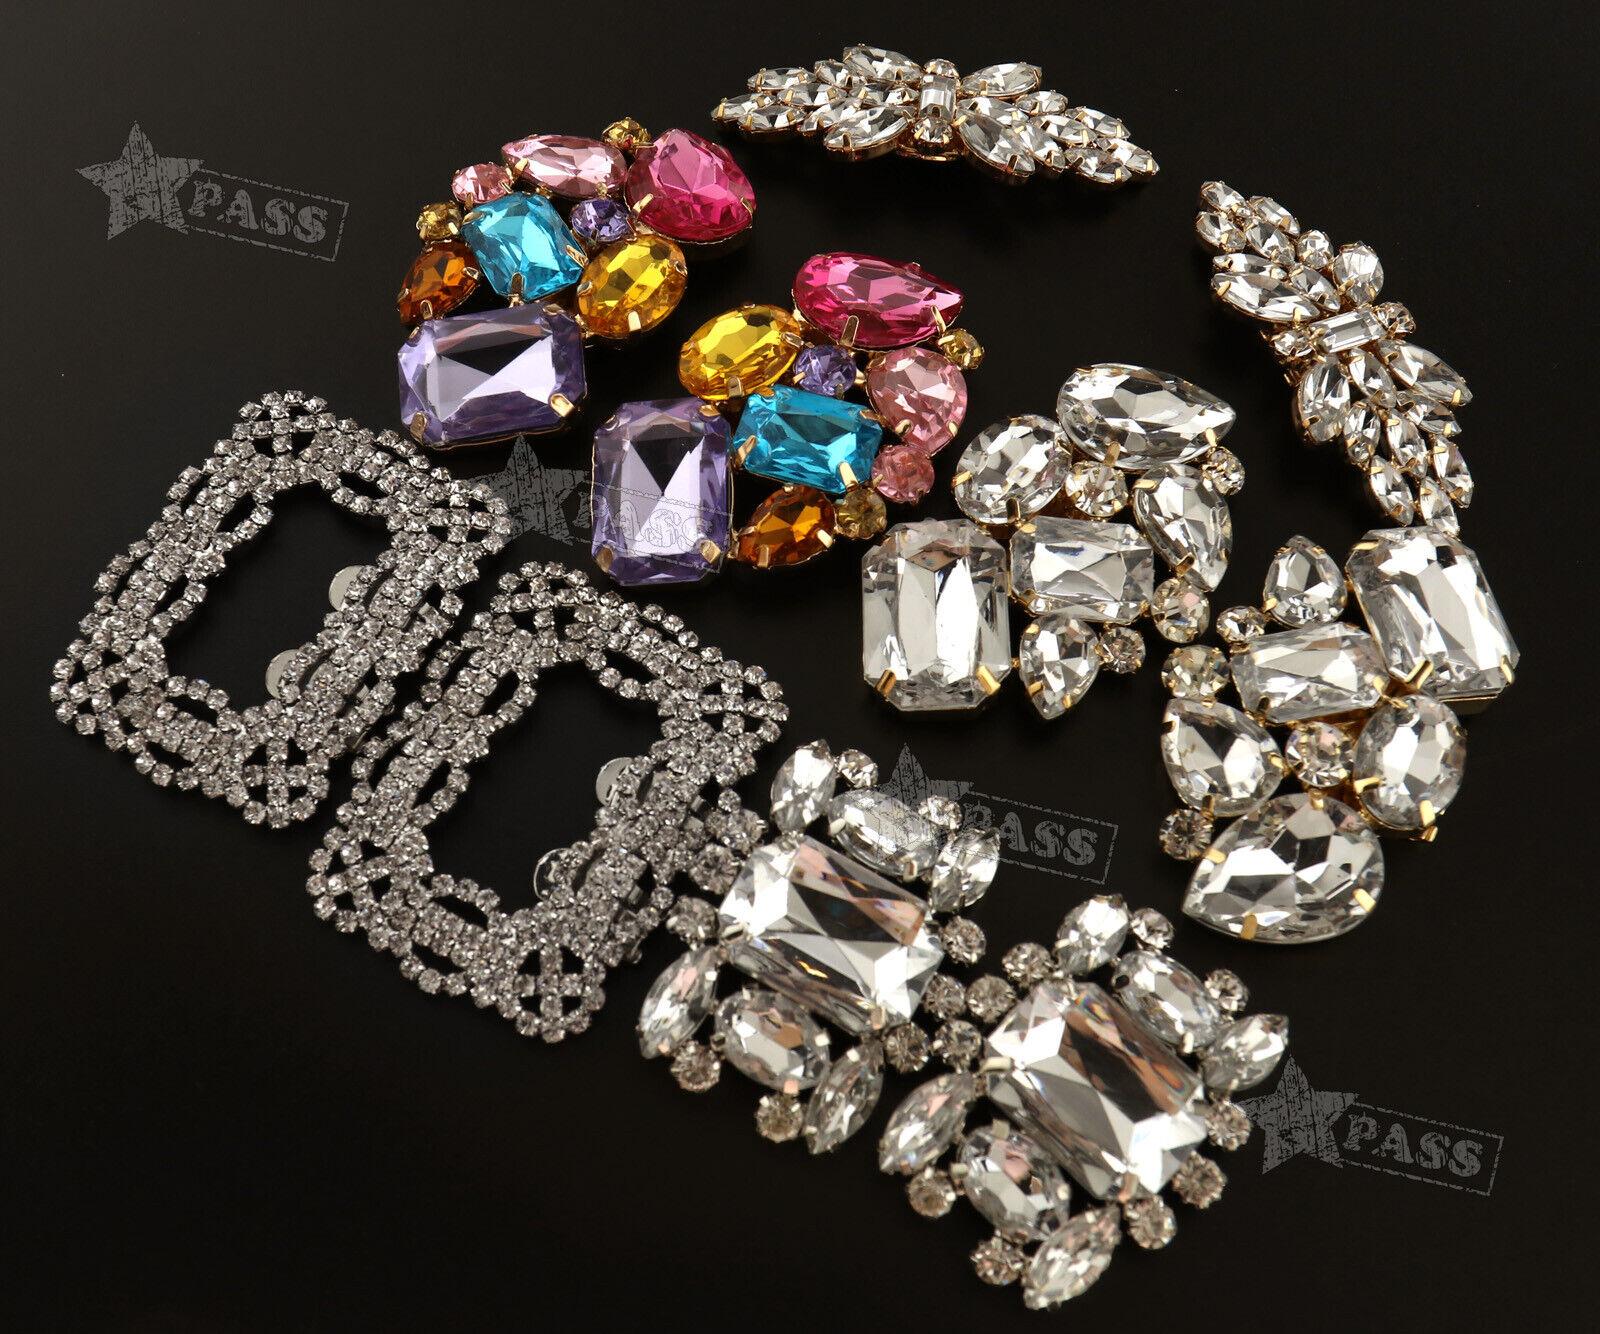 2Pcs Crystal Shoe Clips Charm Bridal Rhinestone Shoes Decor Portable